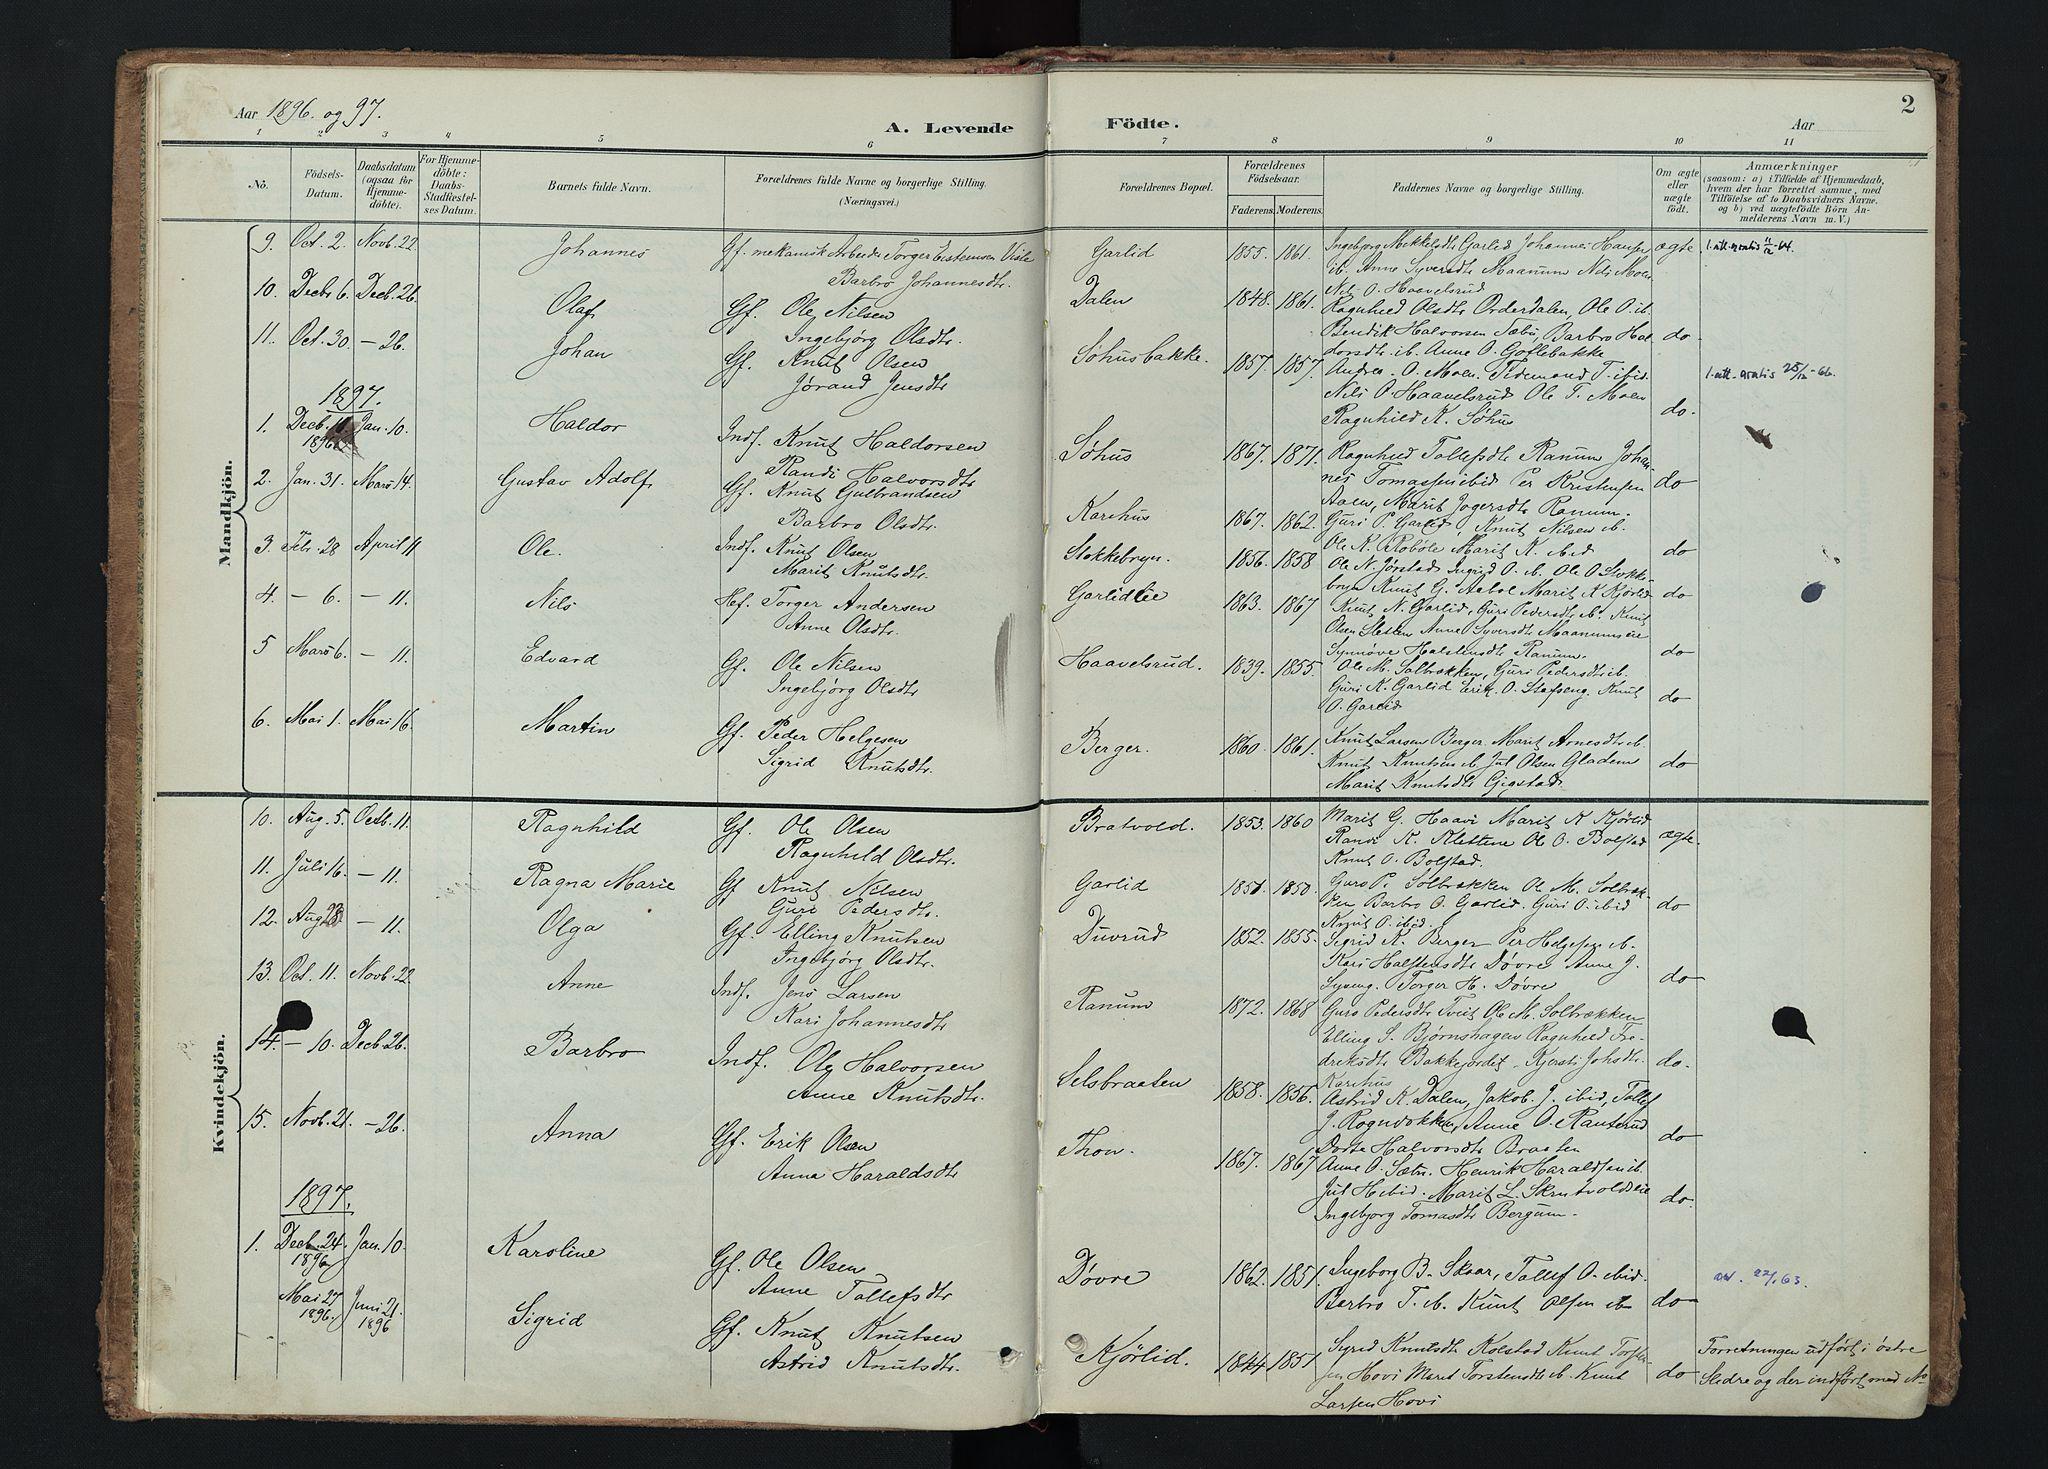 SAH, Nord-Aurdal prestekontor, Ministerialbok nr. 15, 1896-1914, s. 2